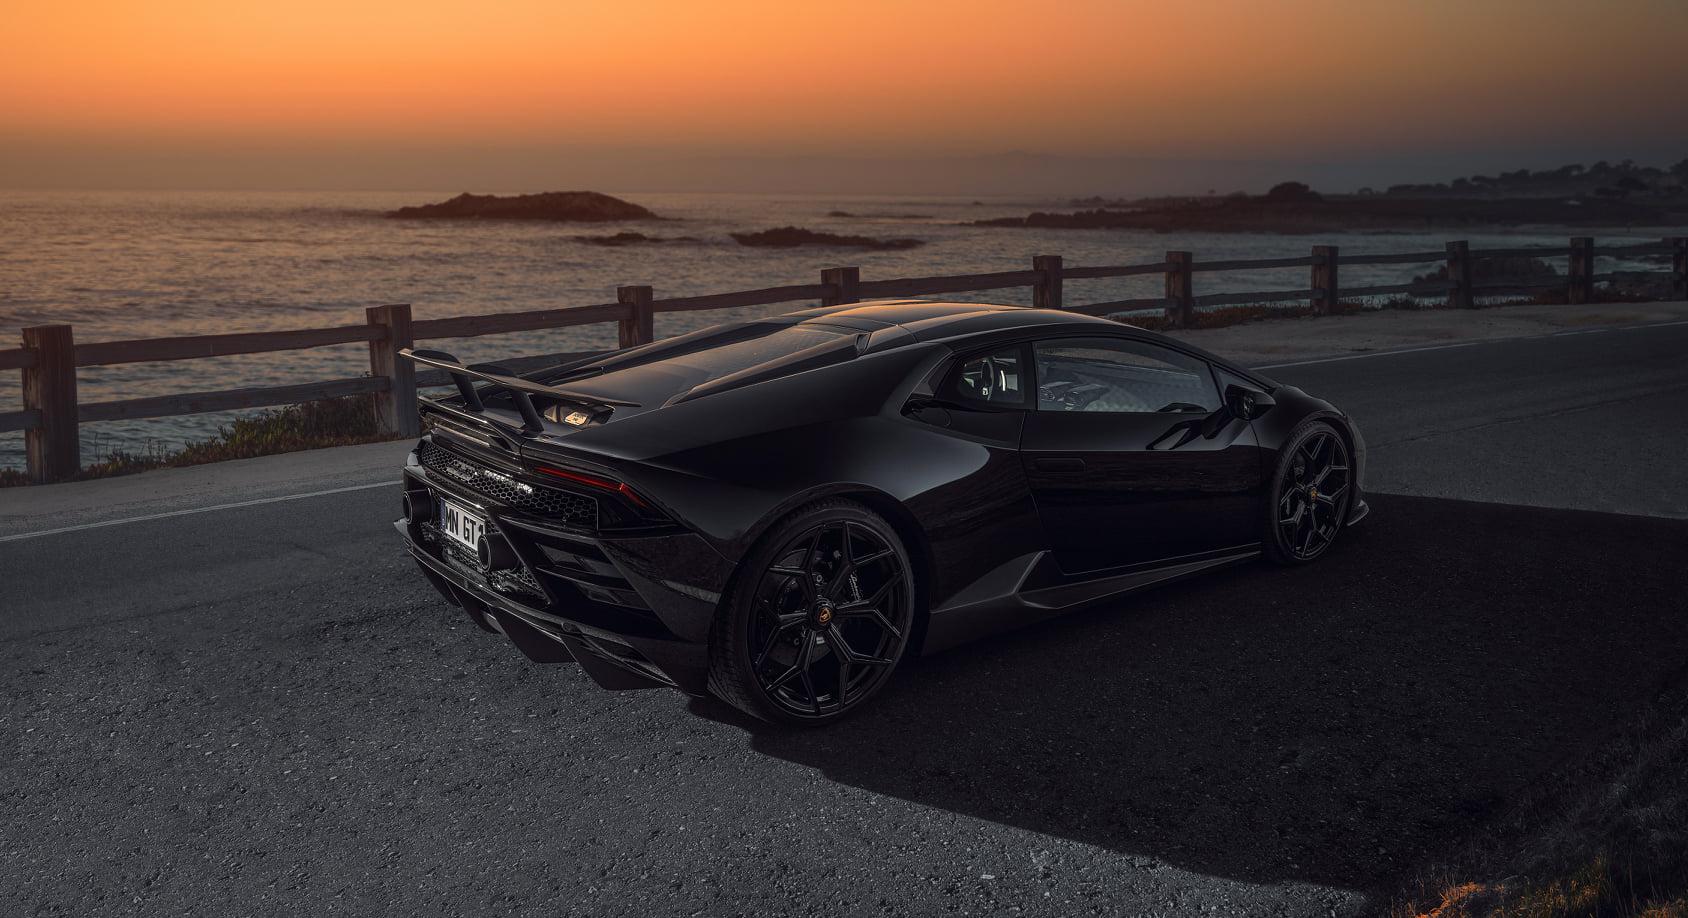 Lamborghini-Huracan-Evo-RWD-by-Novitec-8